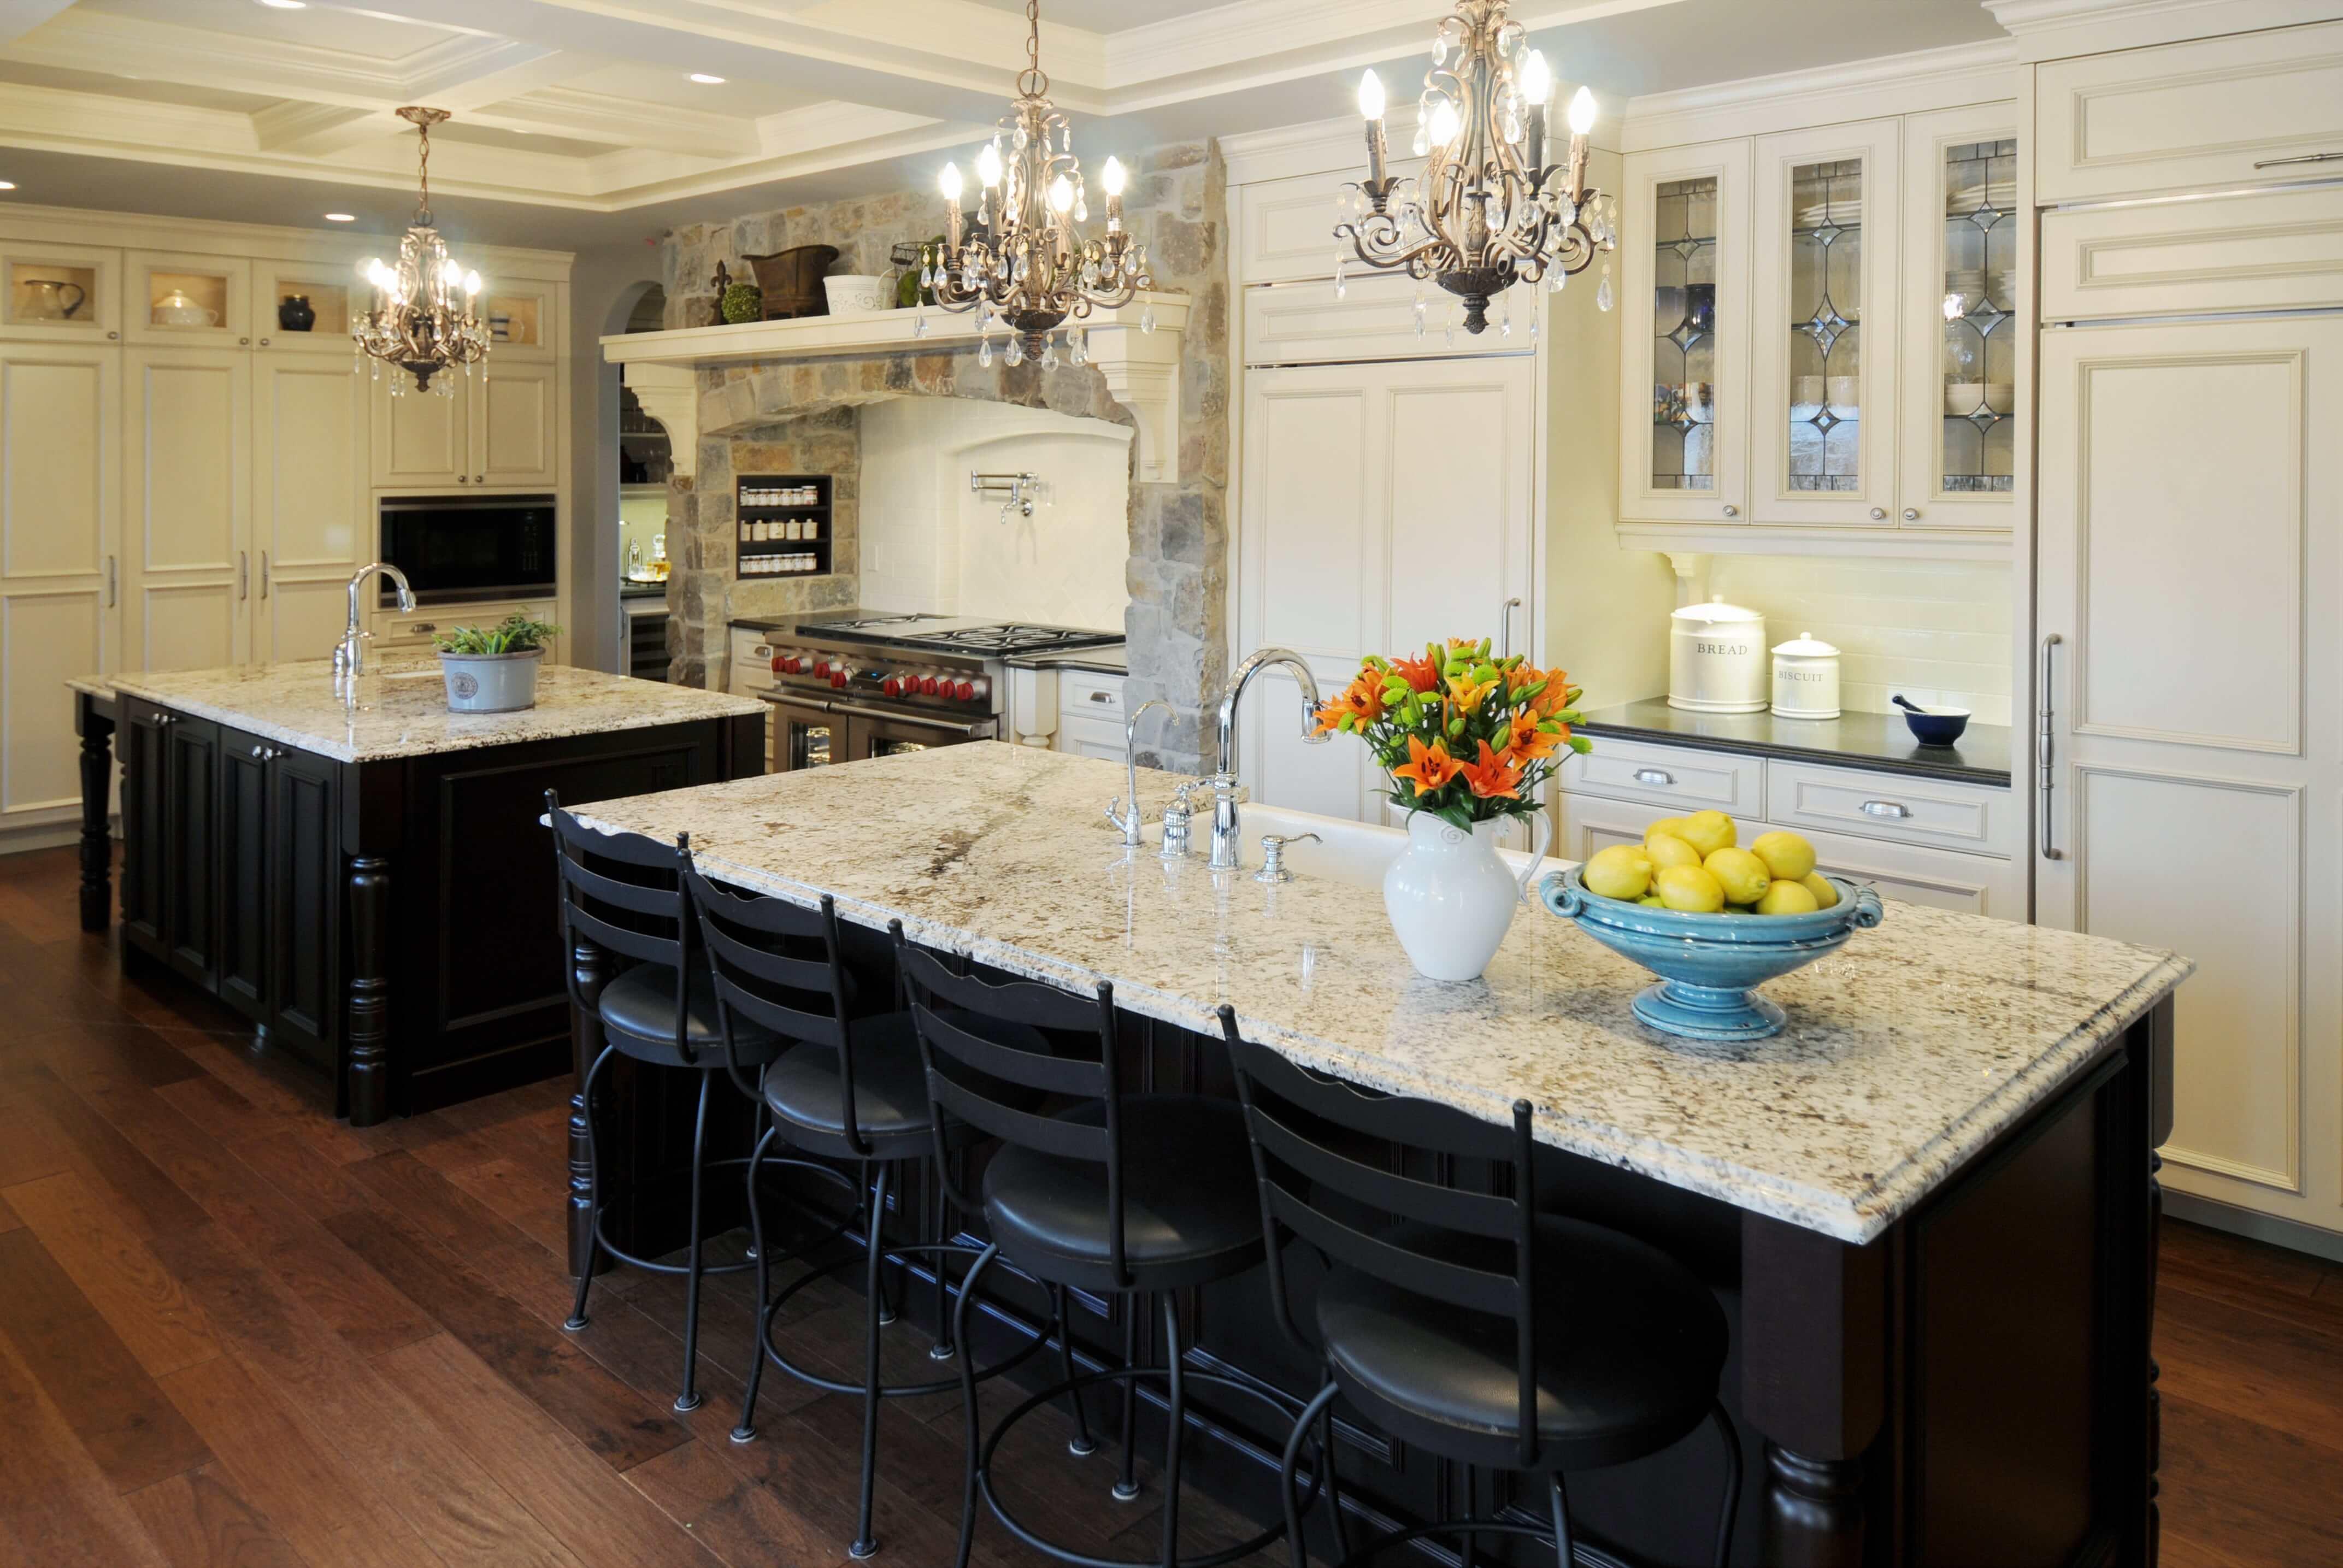 Kitchen Island Ideas Images